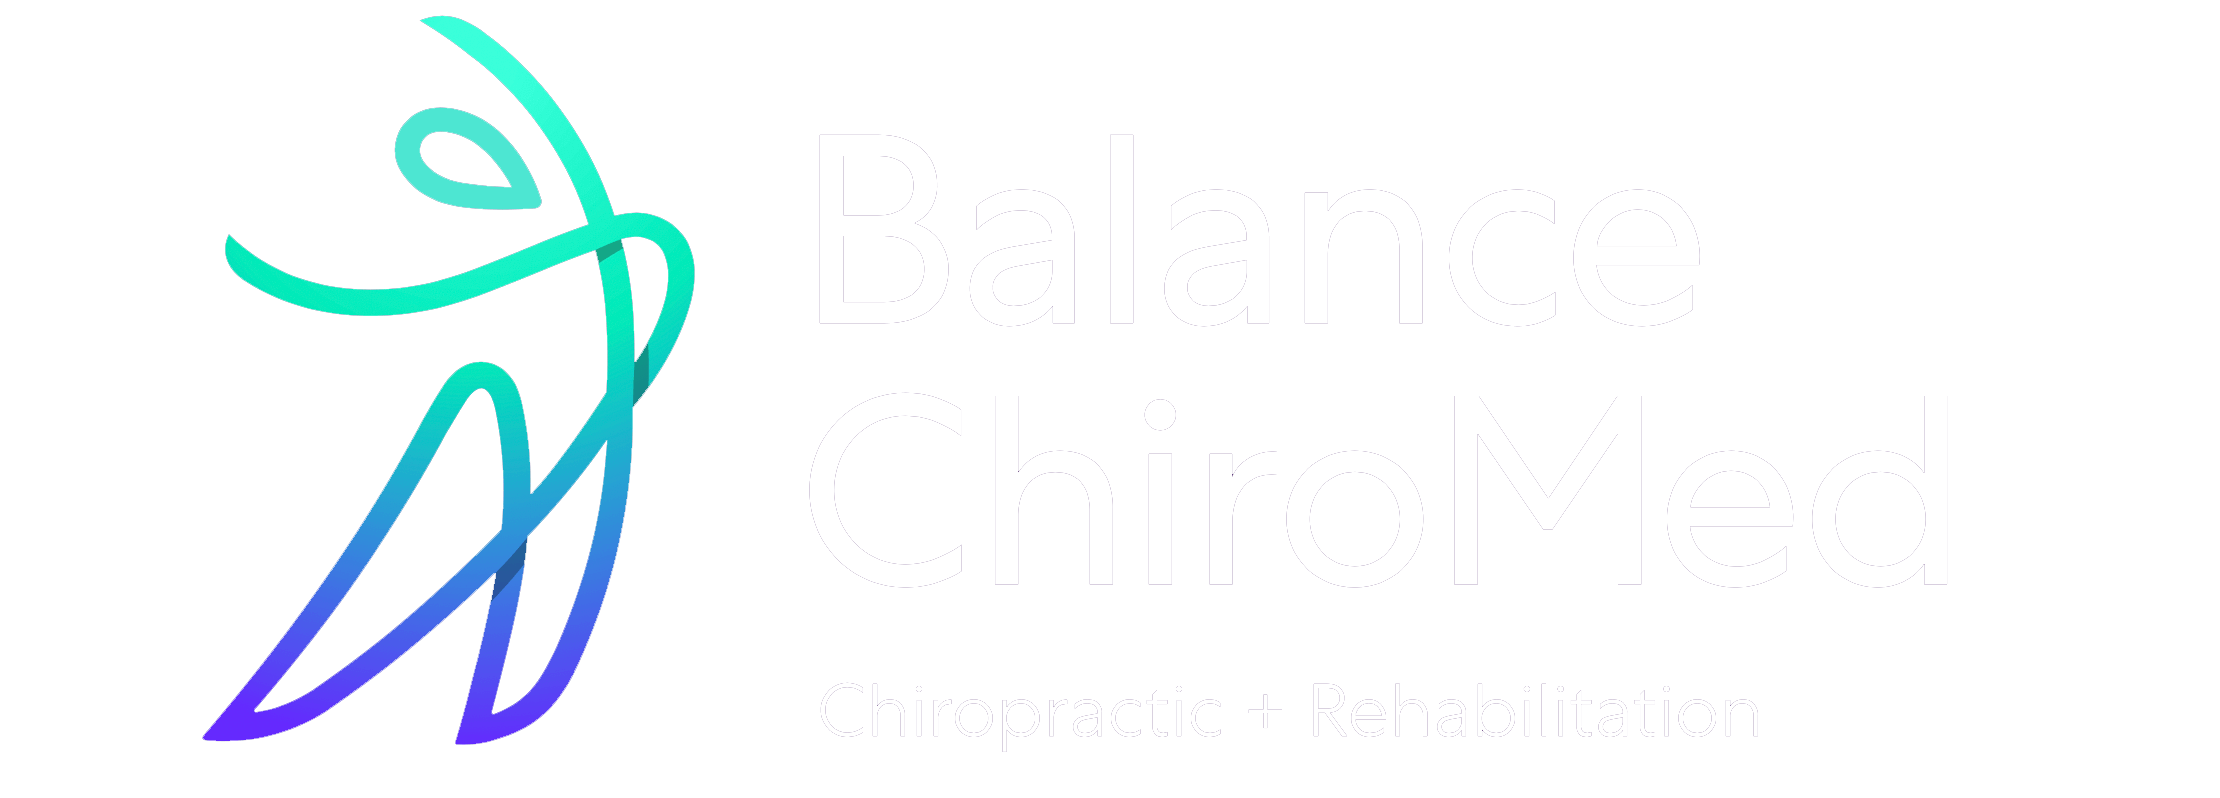 Balance ChiroMed | Burr Ridge Chiropractor | Blue Cross Blue Shield Provider